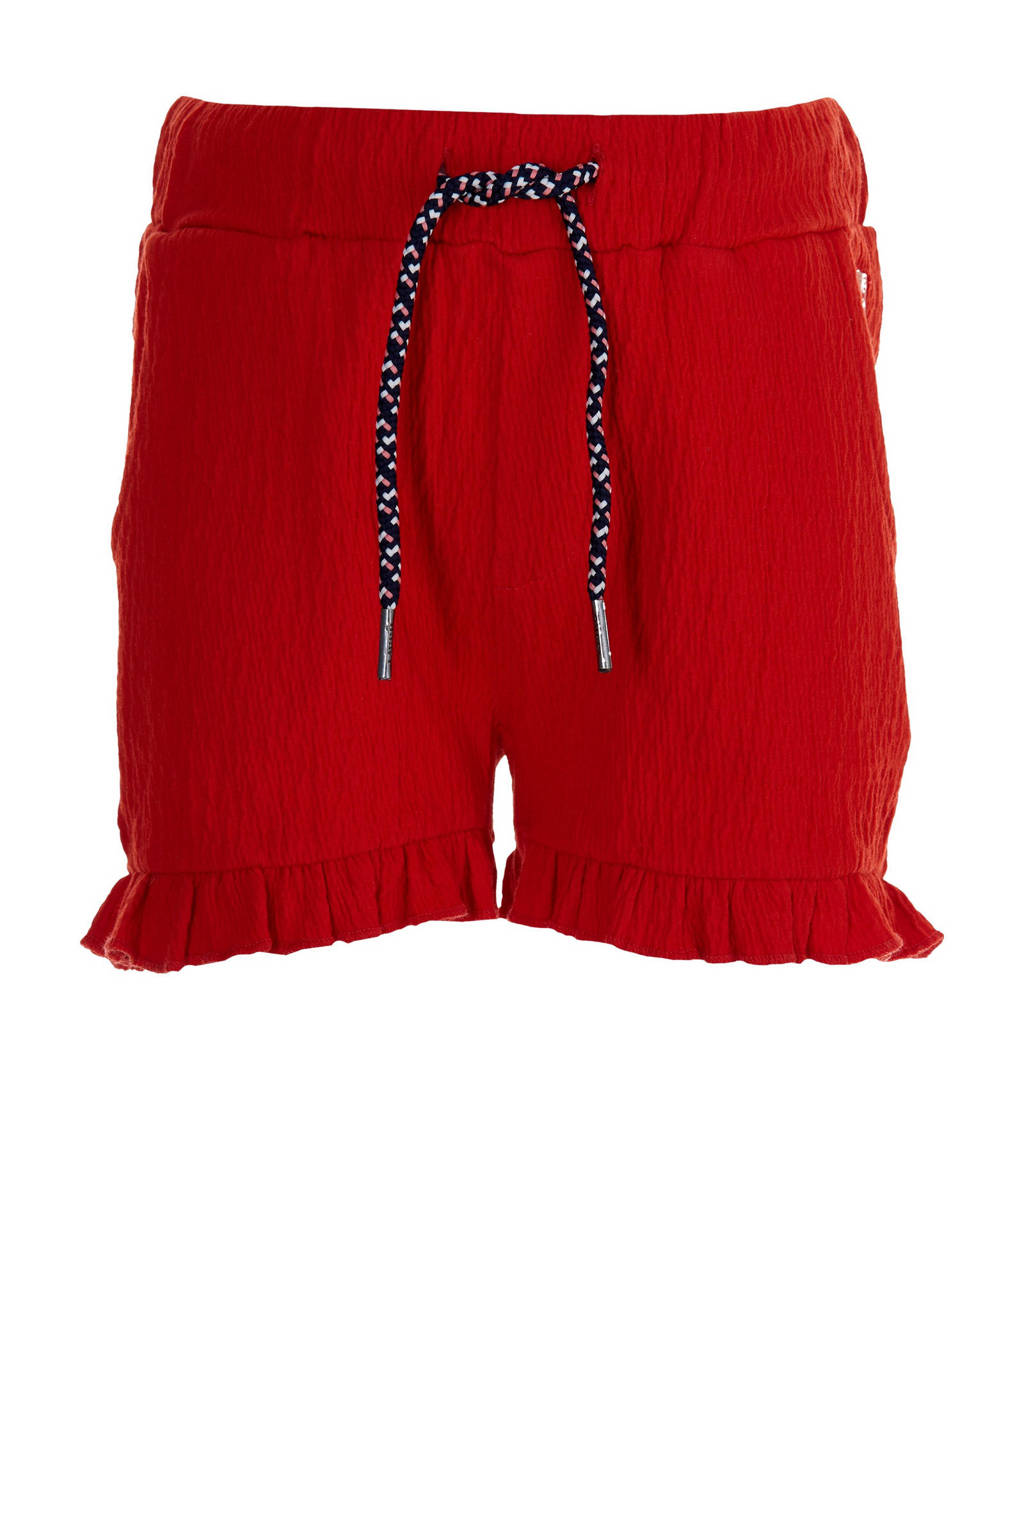 Quapi Girls regular fit short Fimke met textuur rood, Rood